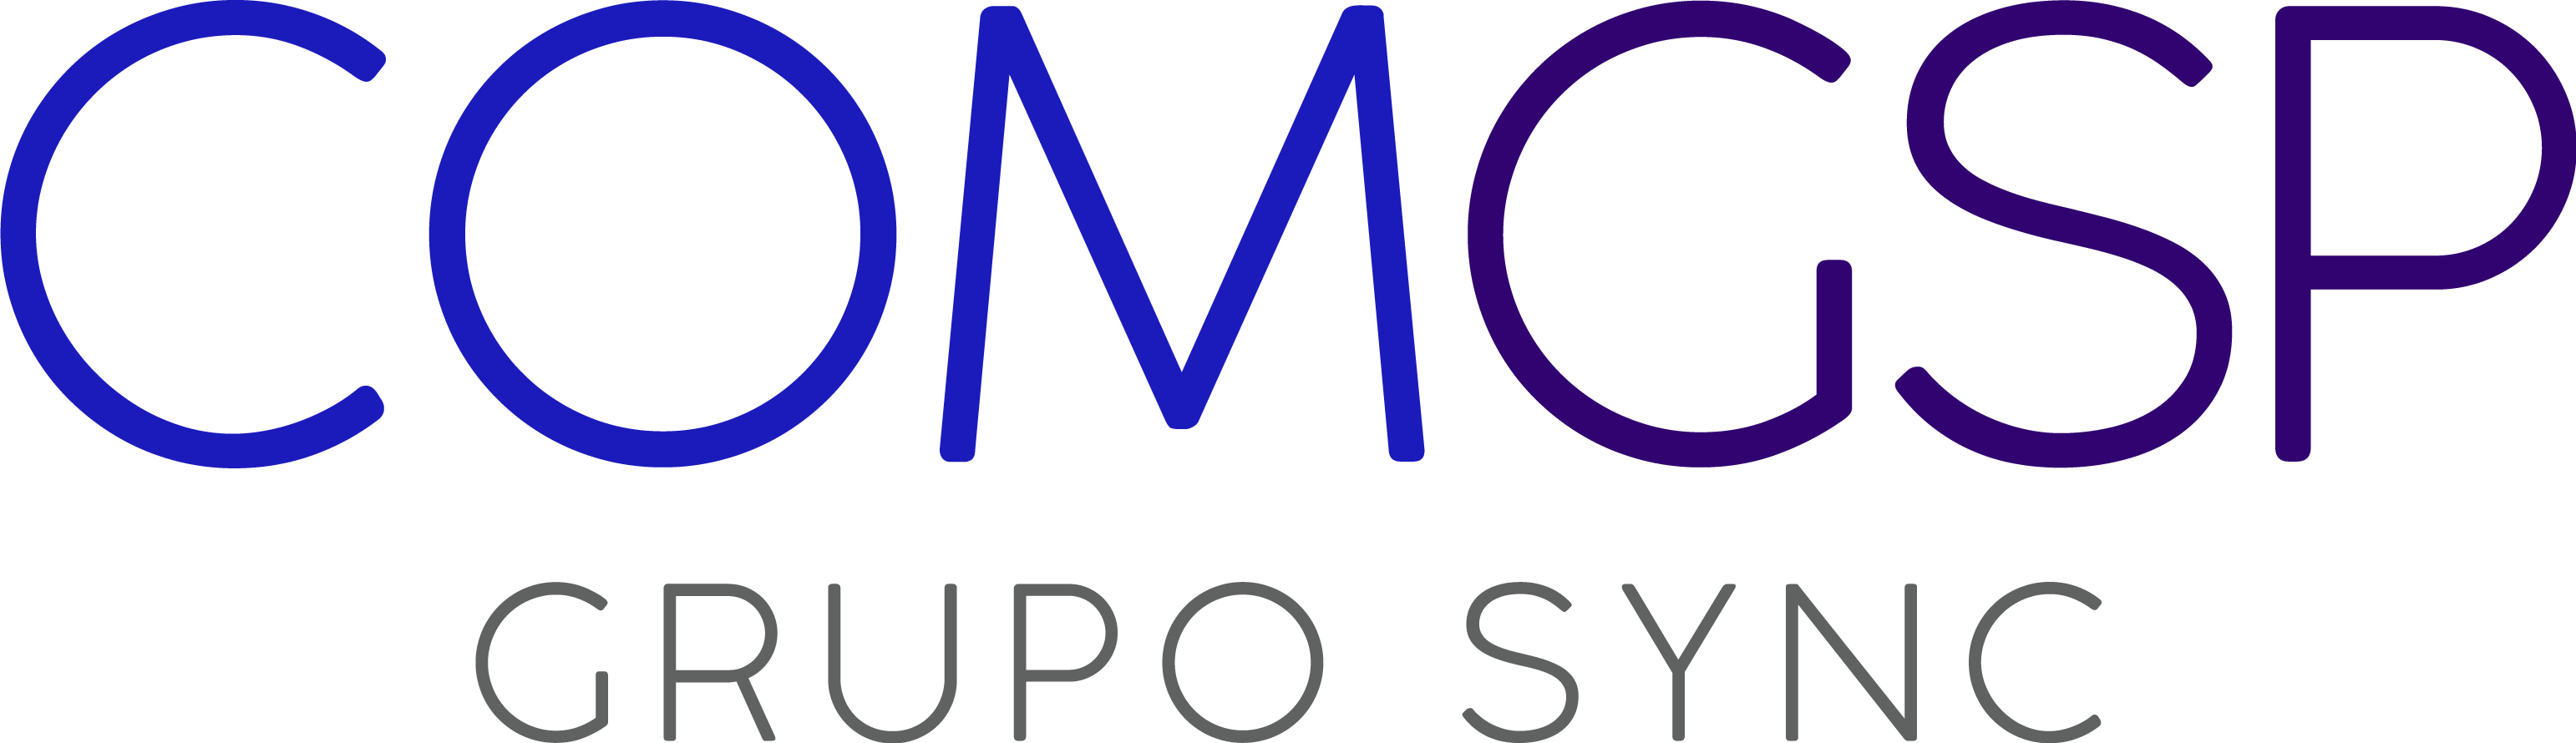 COMGSP Grupo Sync